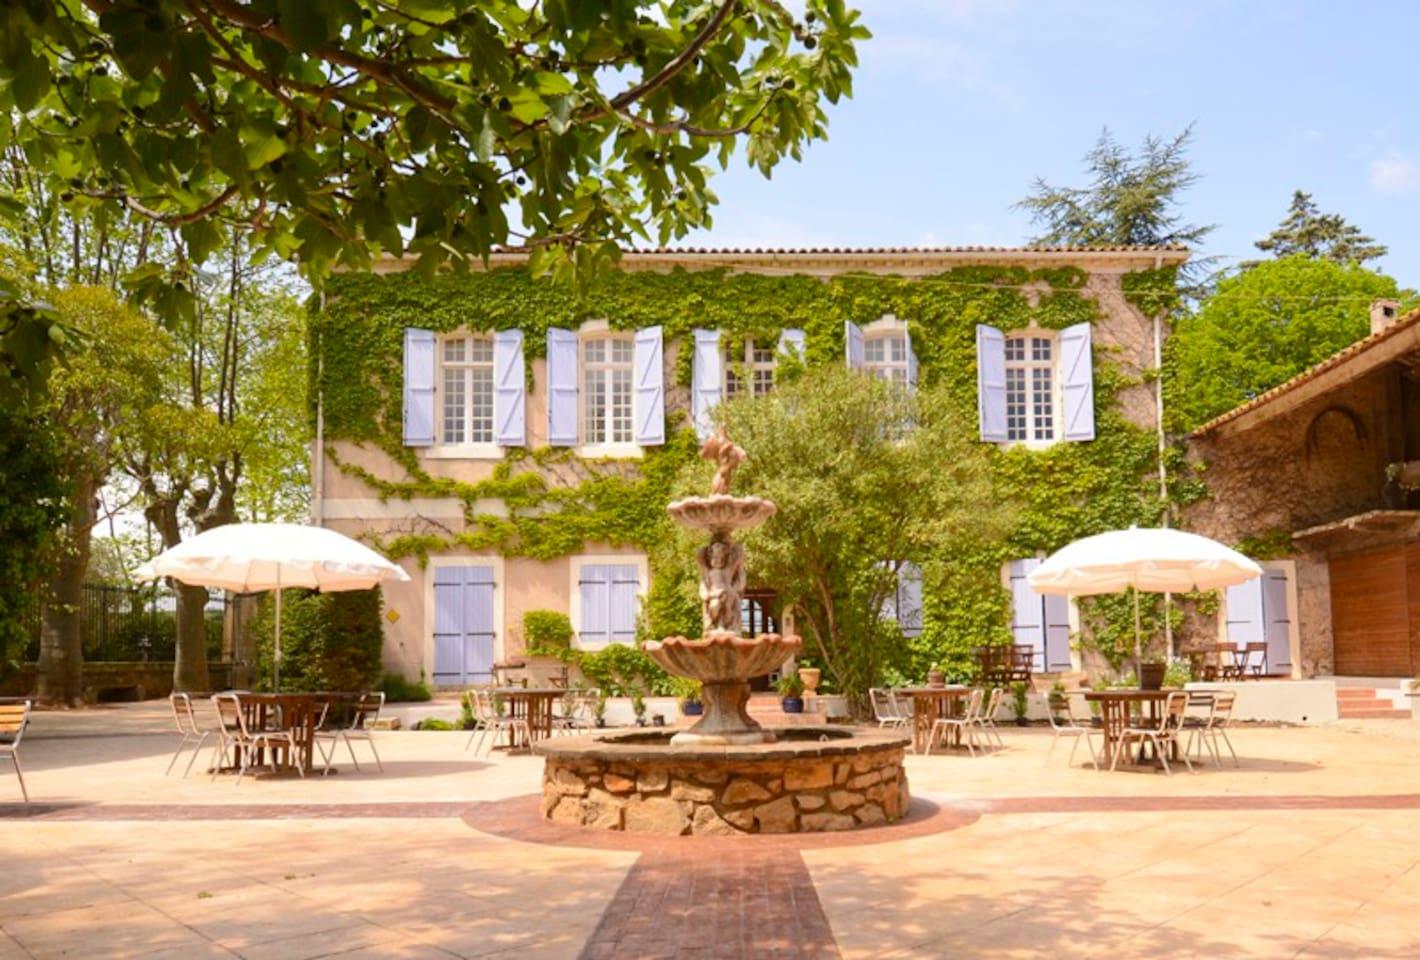 Chateau du Puits es Pratx courtyard restaurant.